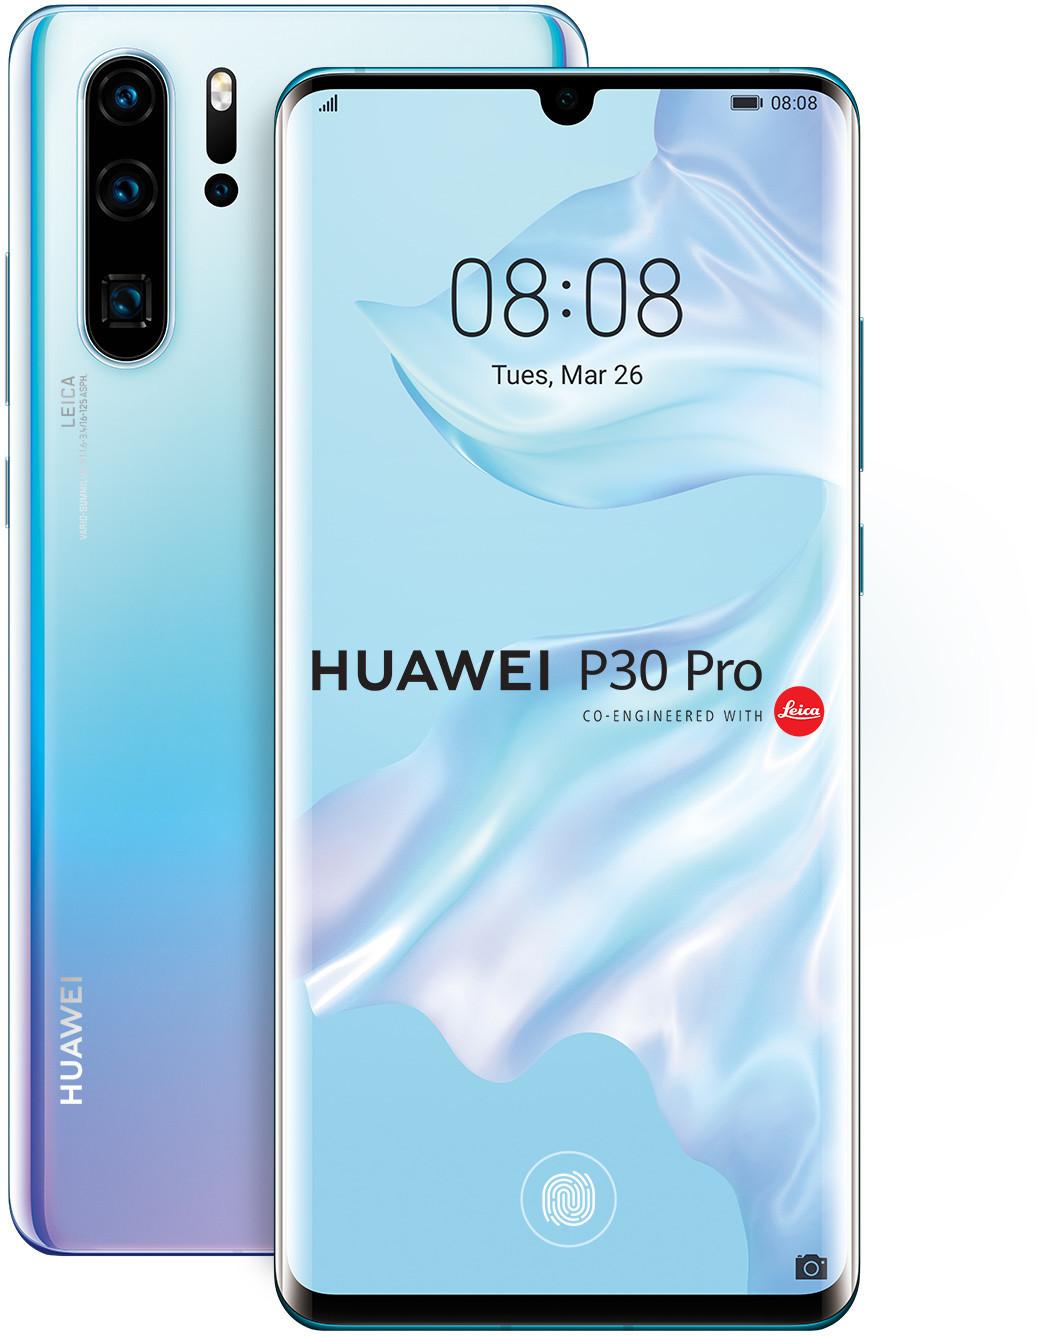 Image of Huawei P30 Pro 8GB 128GB Breathing Crystal